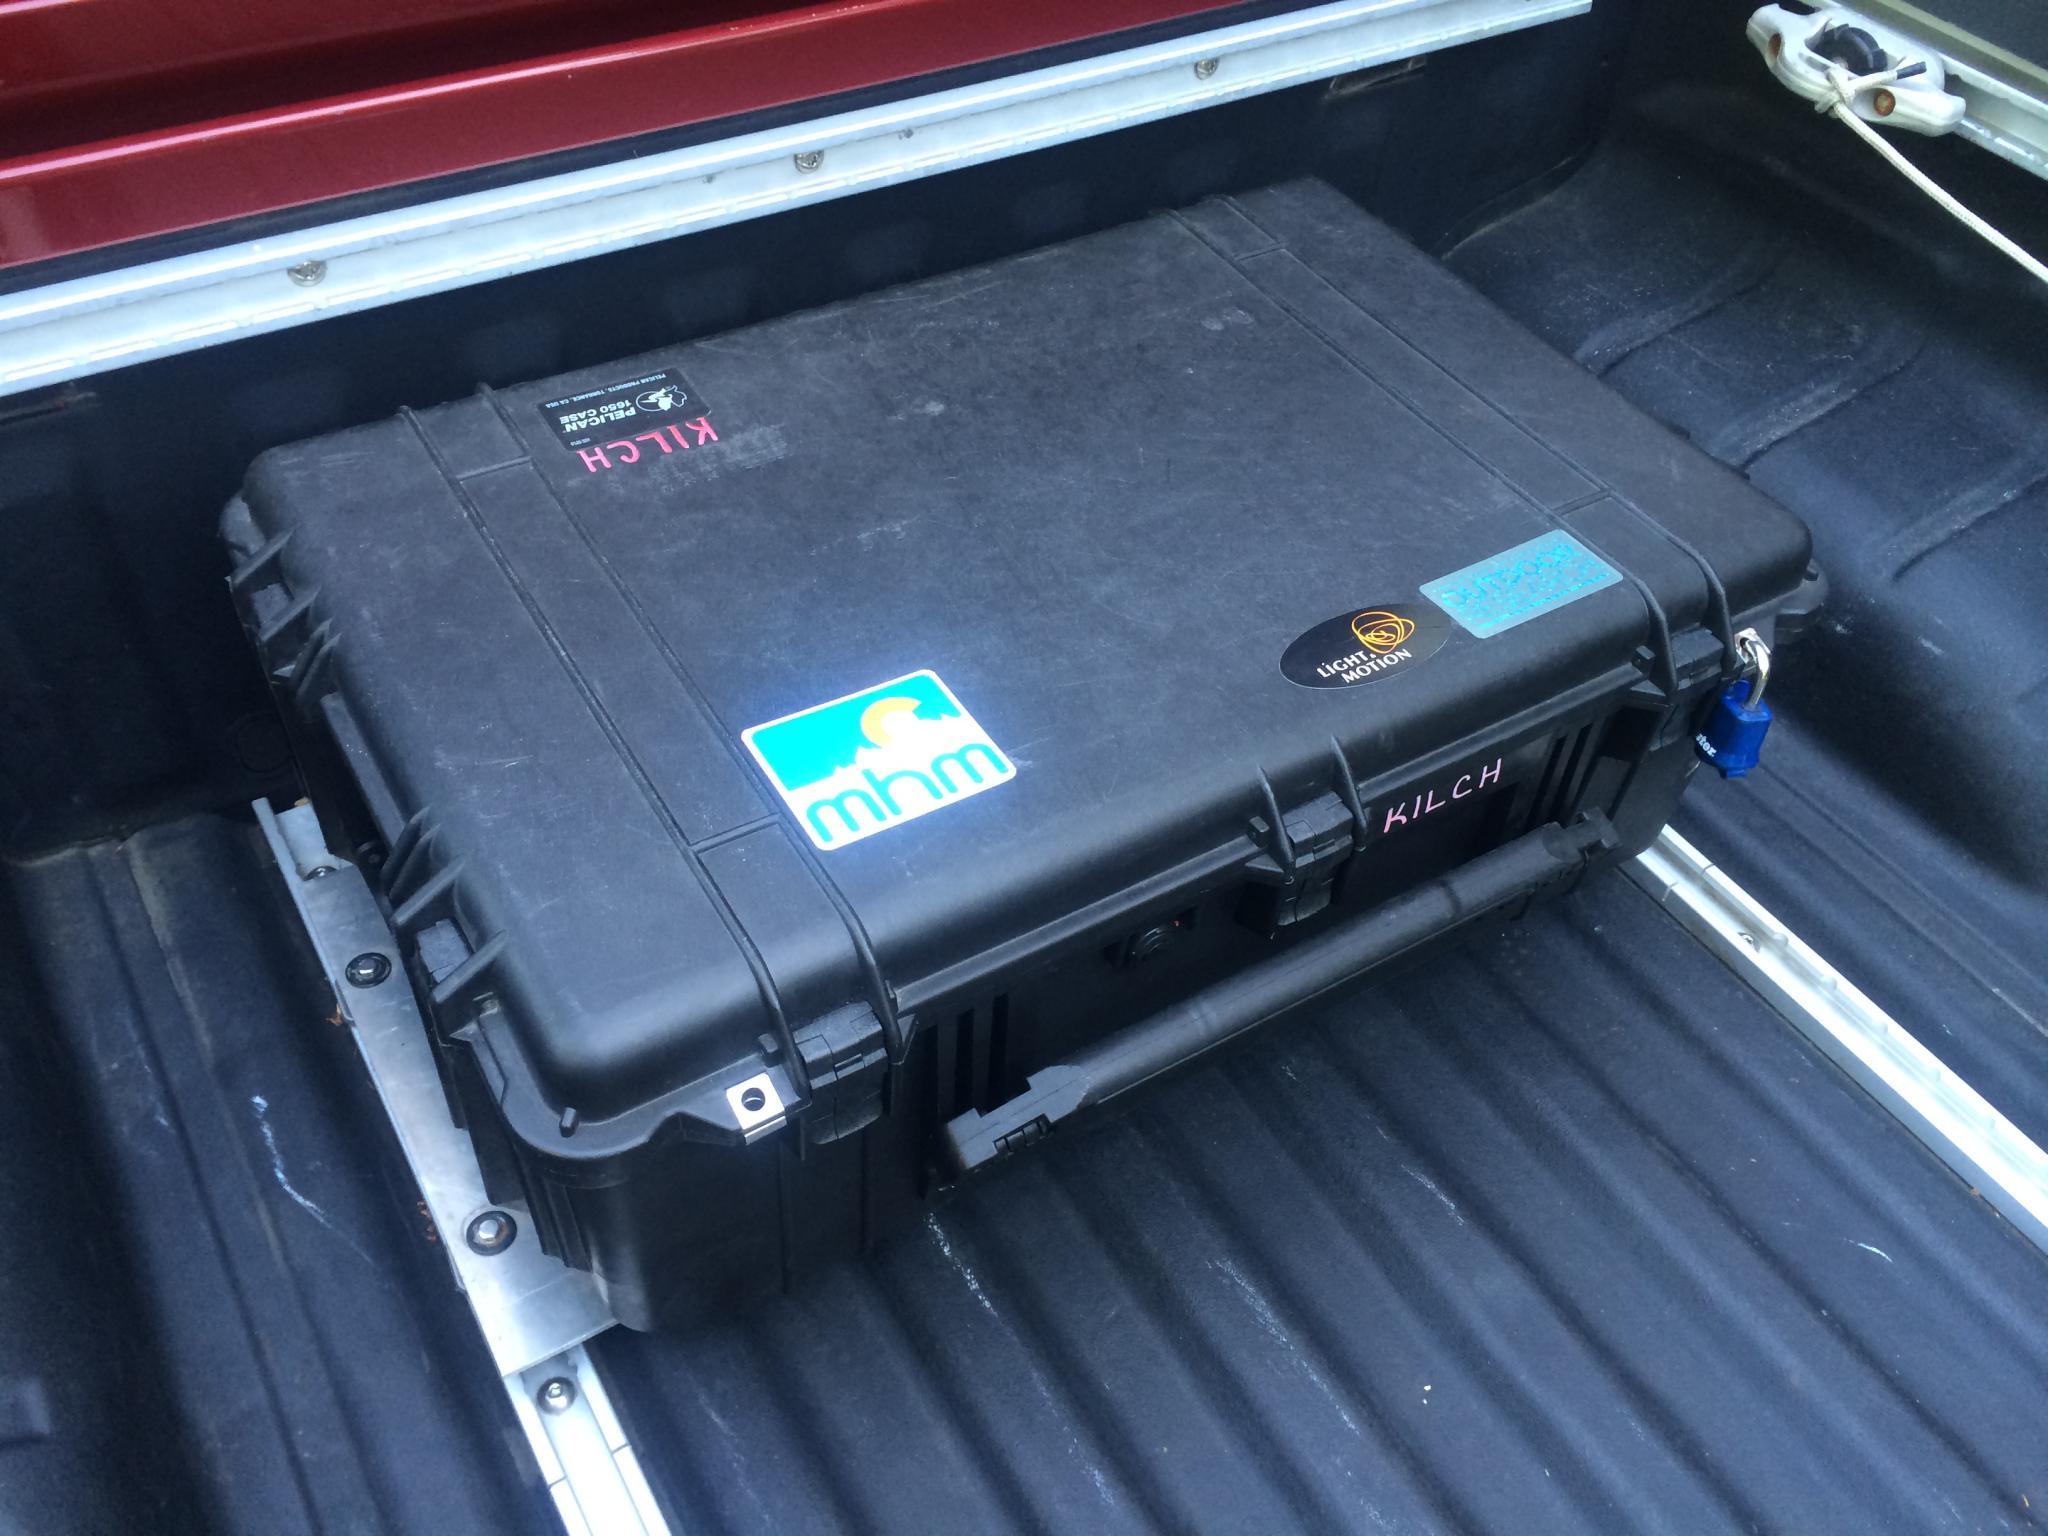 Nissan Frontier Nismo >> DIY Modular Pelican Case Utilitrack Tool Box Mount - Nissan Frontier Forum